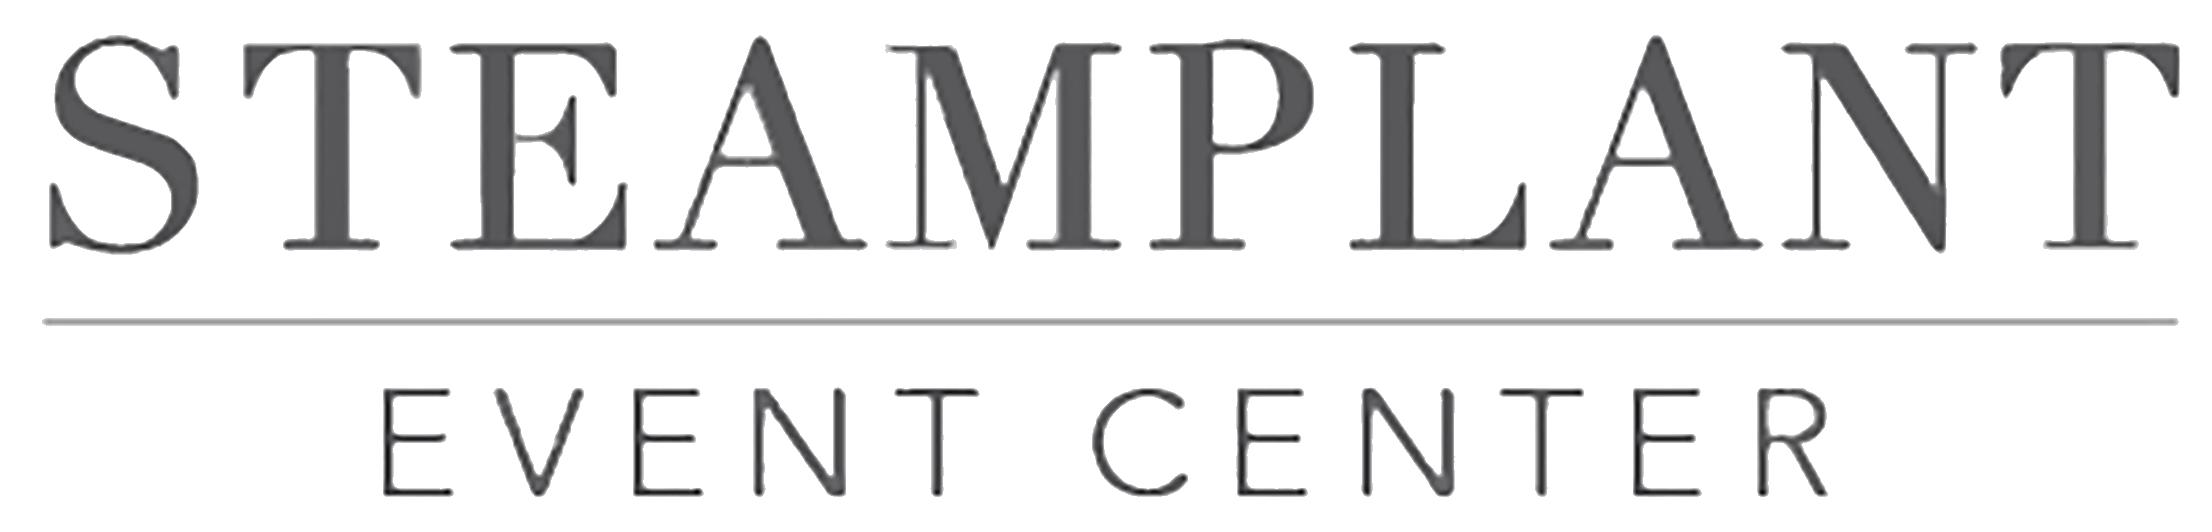 SteamPlant Event Center